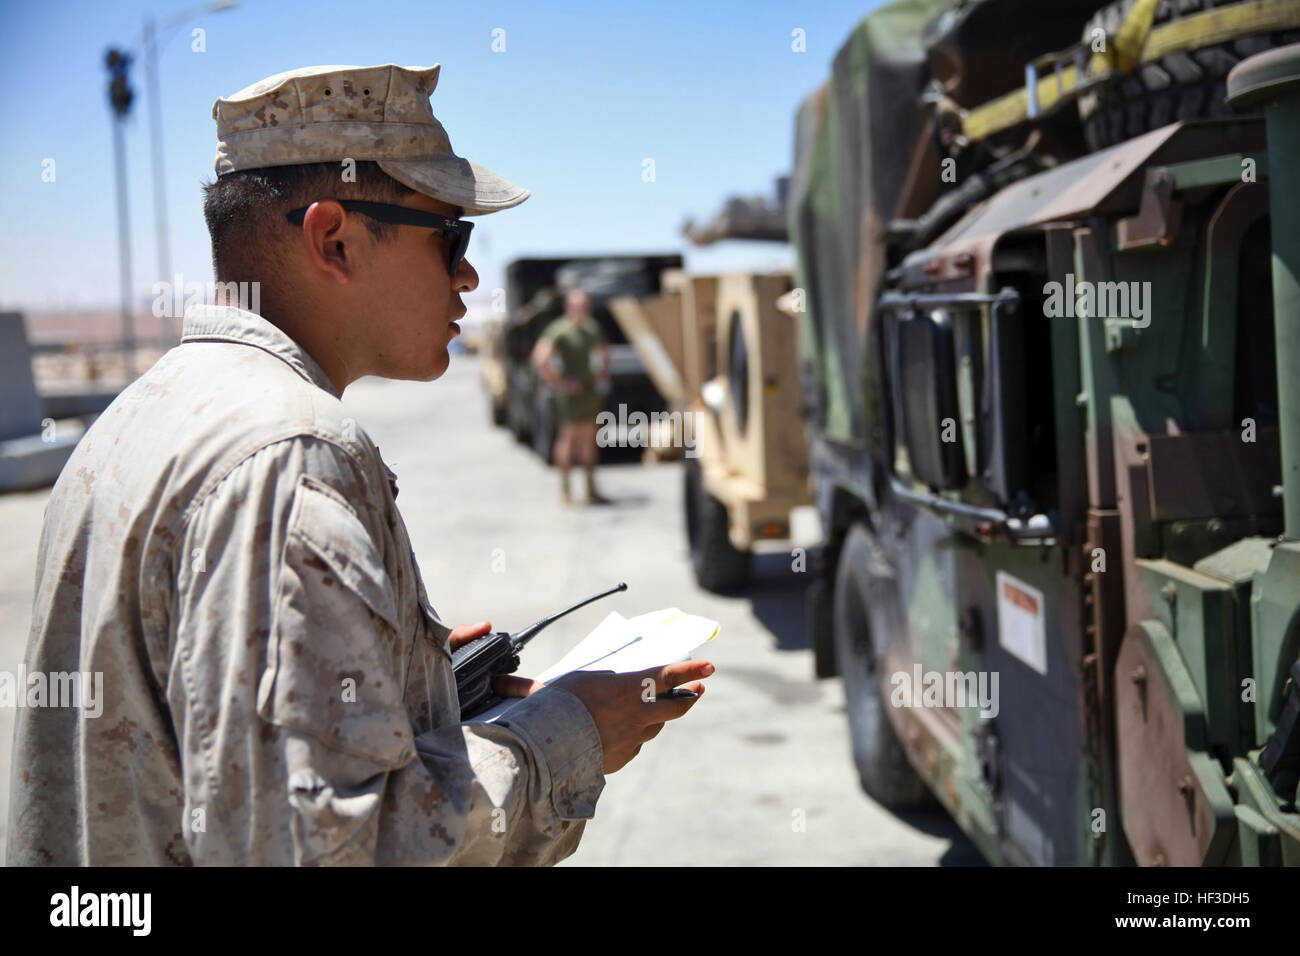 Lance Cpl. Rodrigo Ortega, a landing support specialist with ...